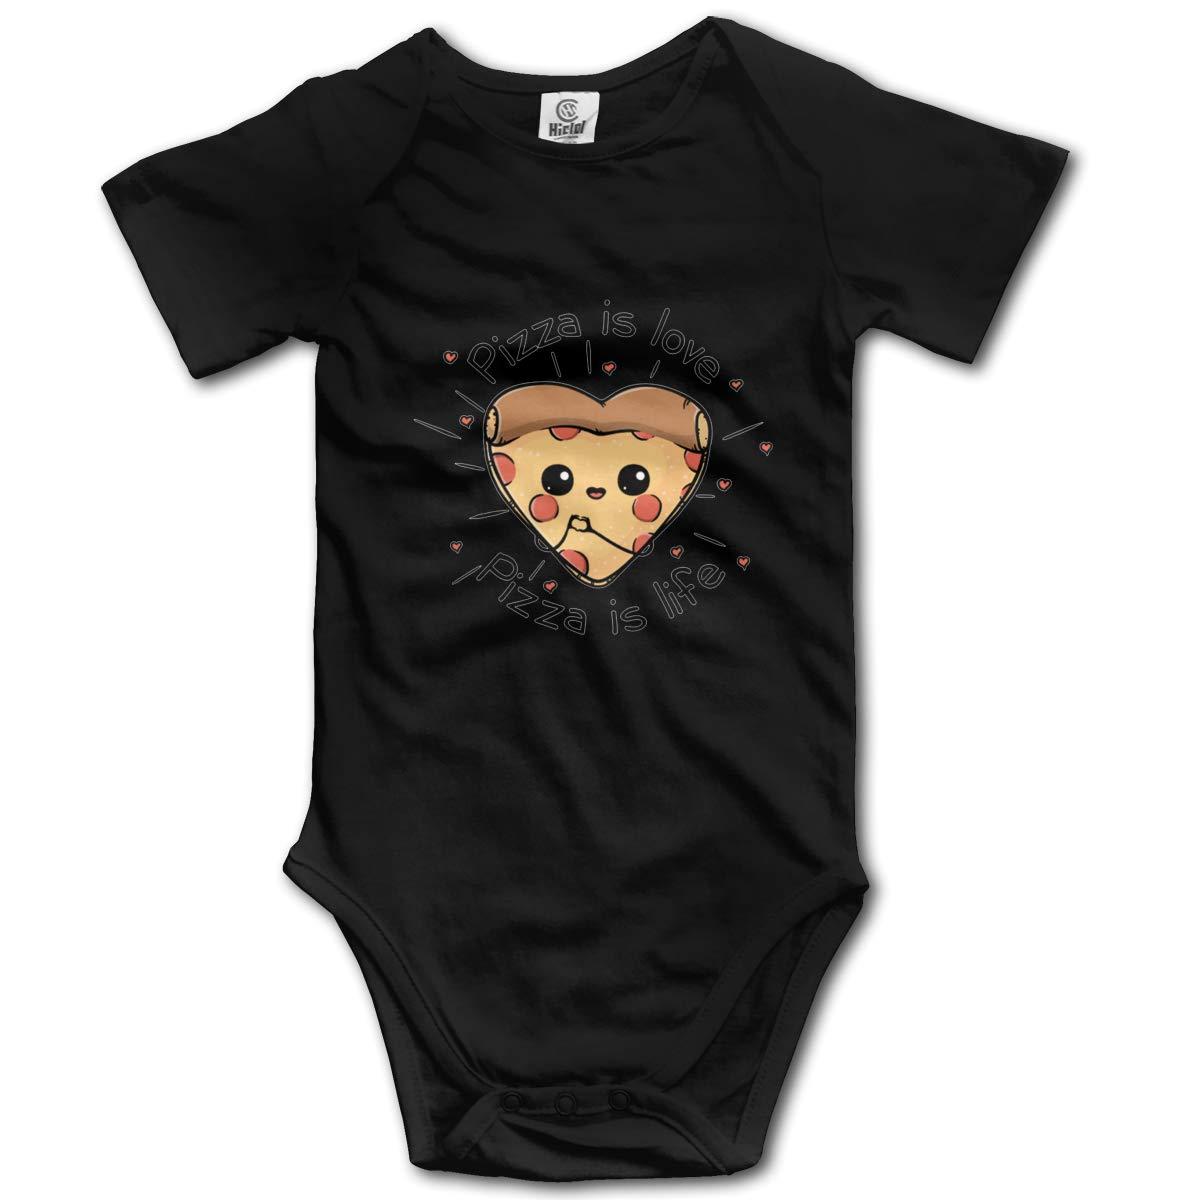 FOECBIR Pizza is Love.PNG Infant Boys Girls Jumpsuit Short-Sleeve Romper Bodysuits